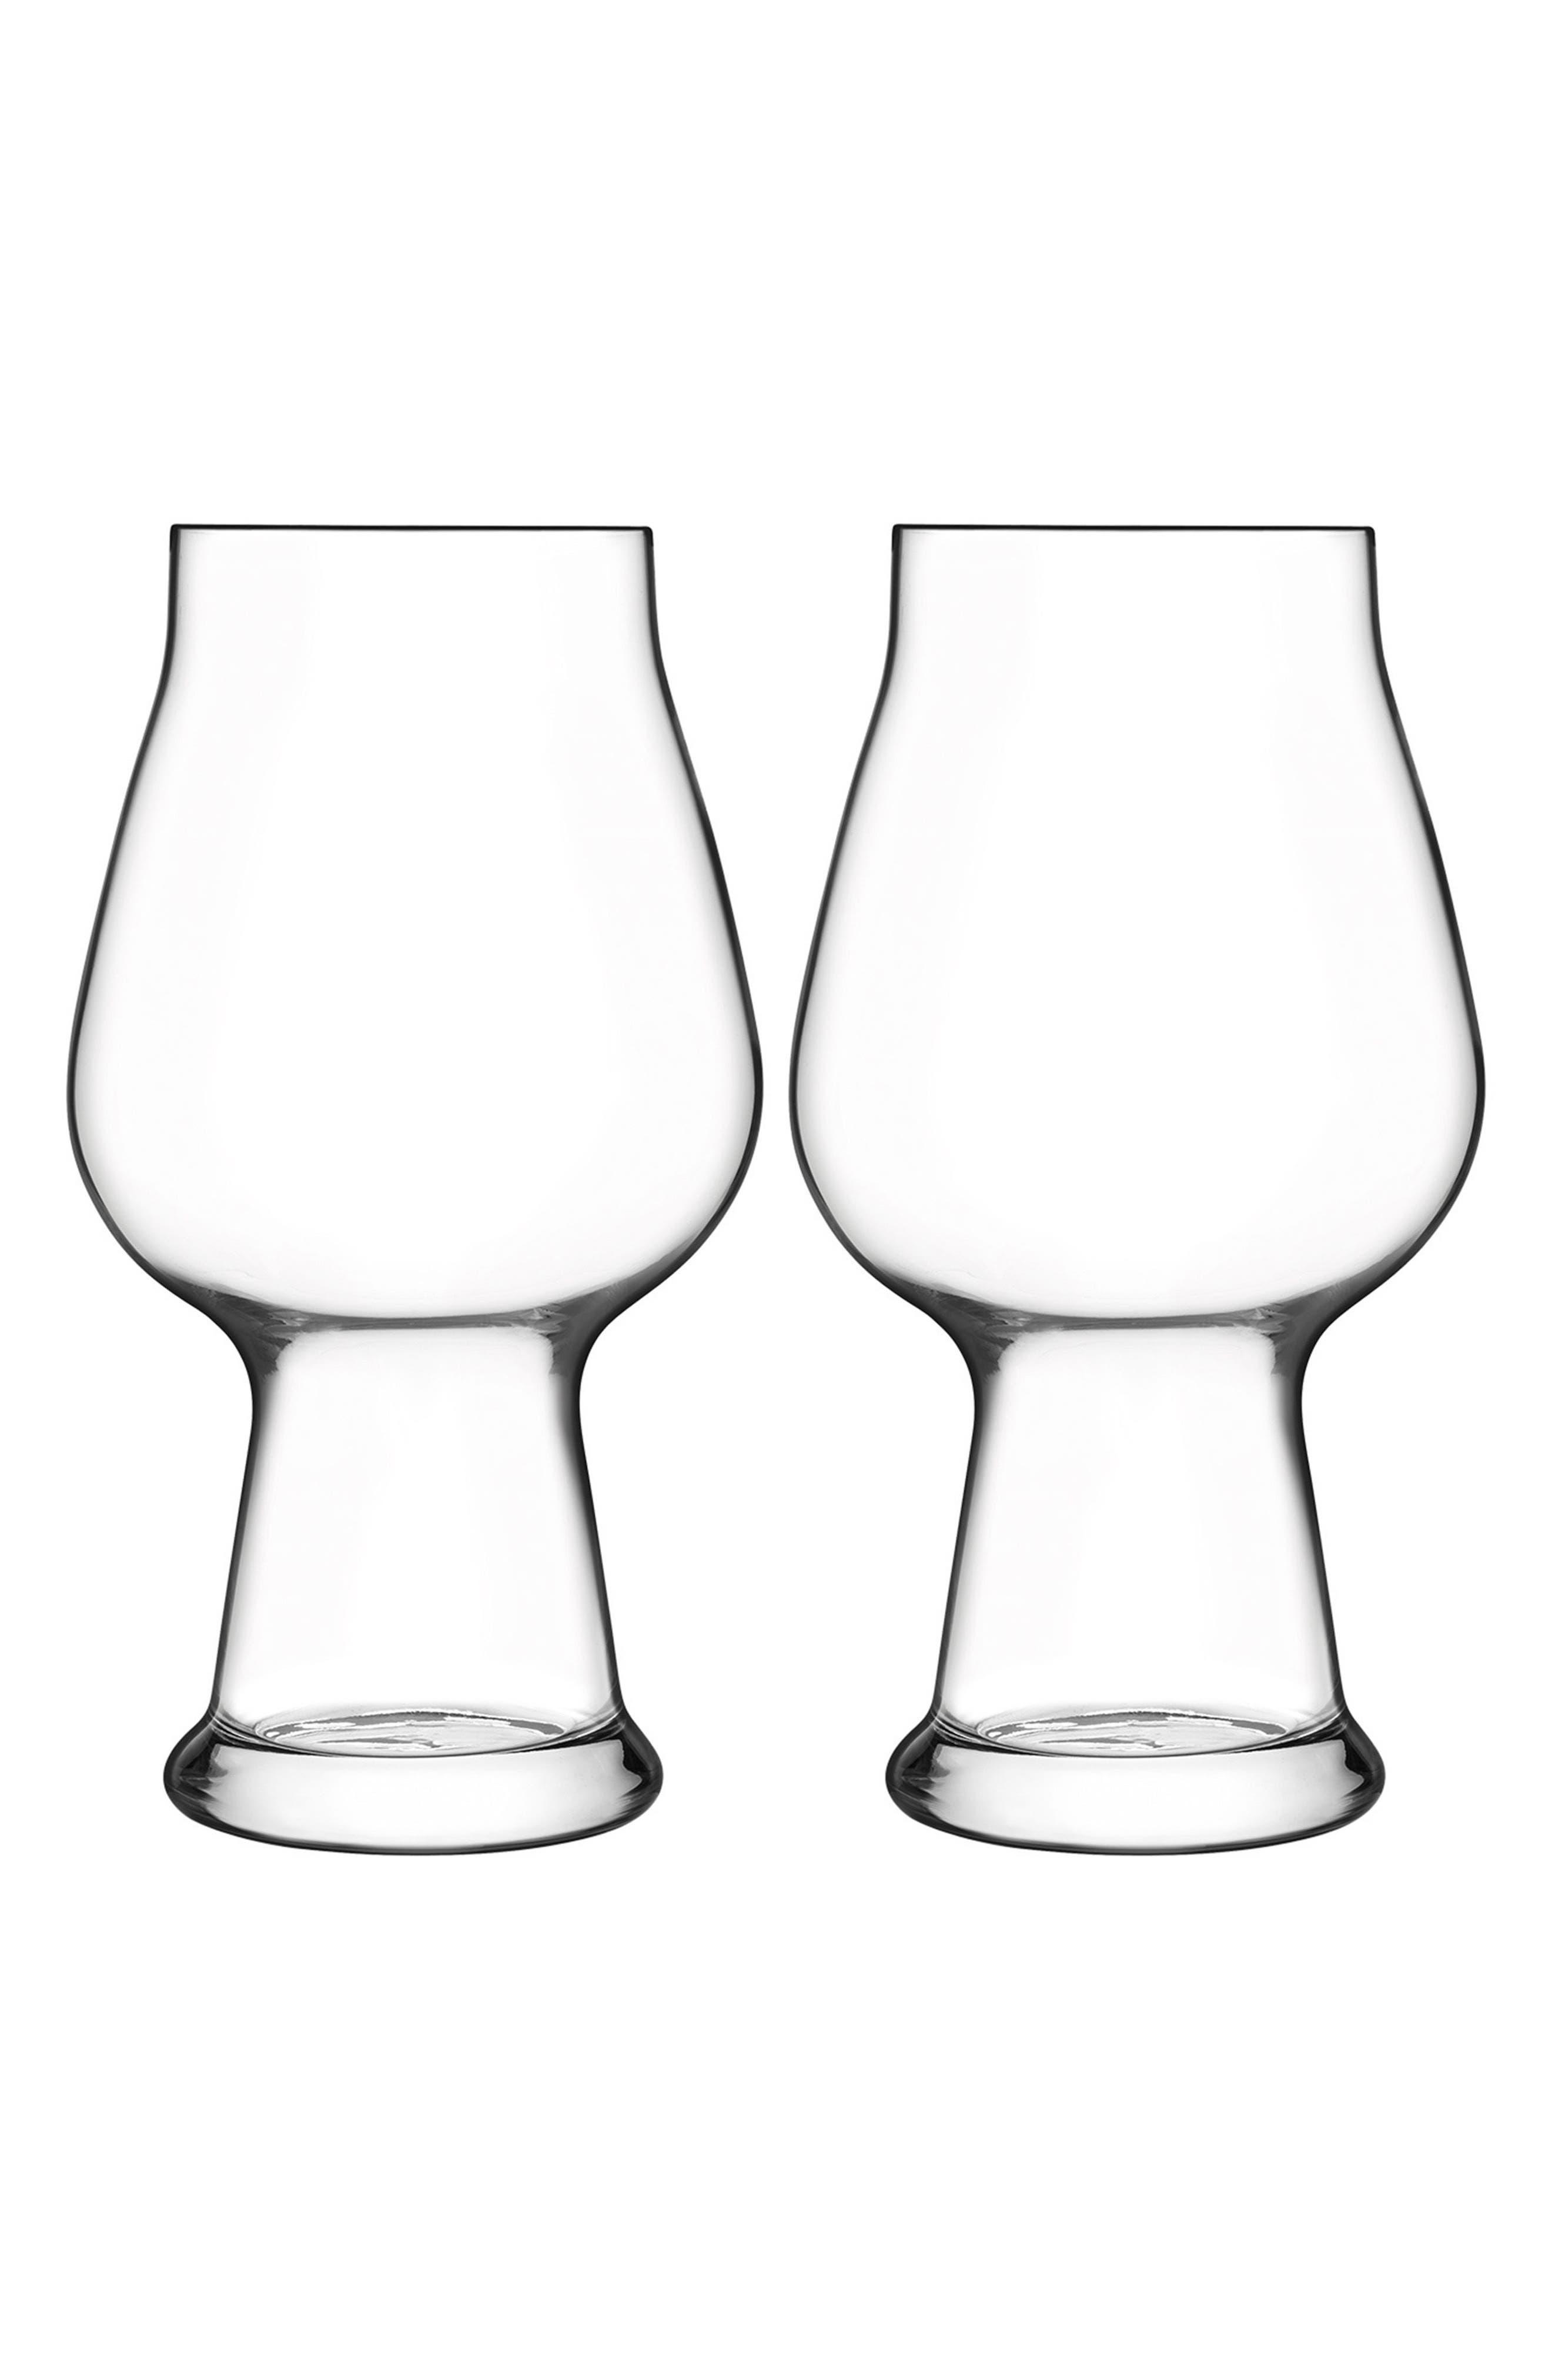 Main Image - Luigi Bormioli Birrateque Set of 2 Stout Glasses